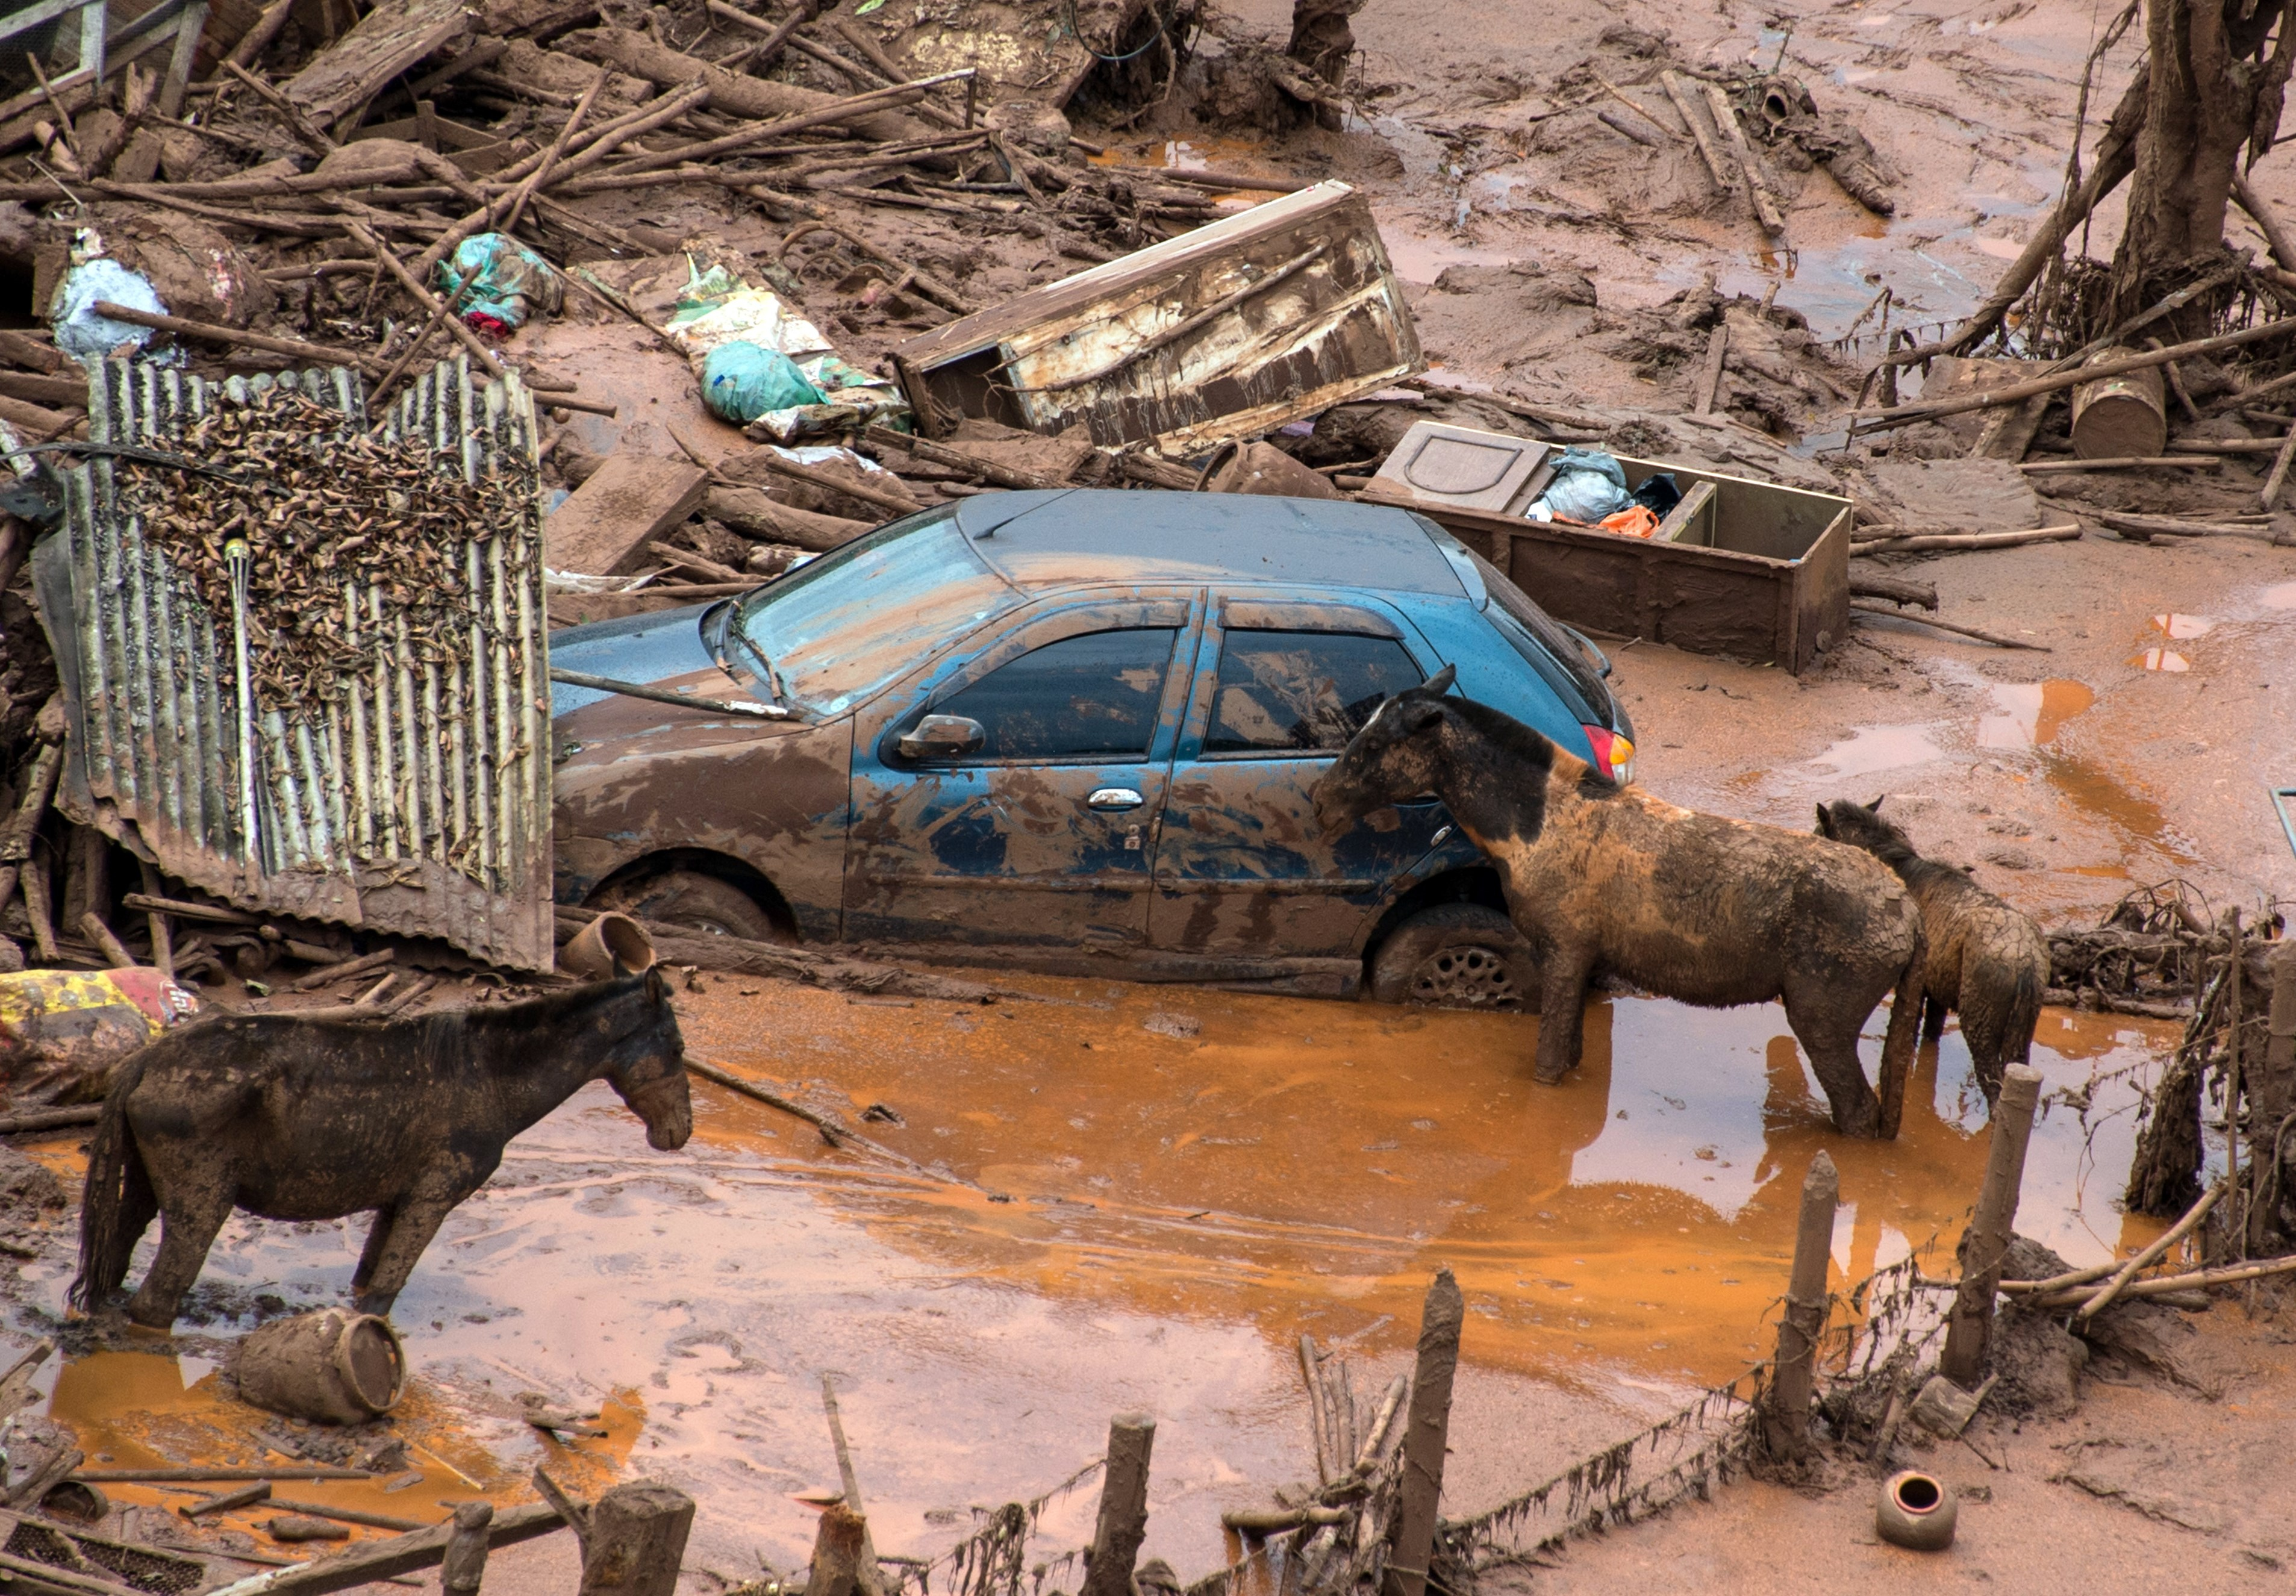 BRAZIL-AUSTRALIA-MINING-ACCIDENT